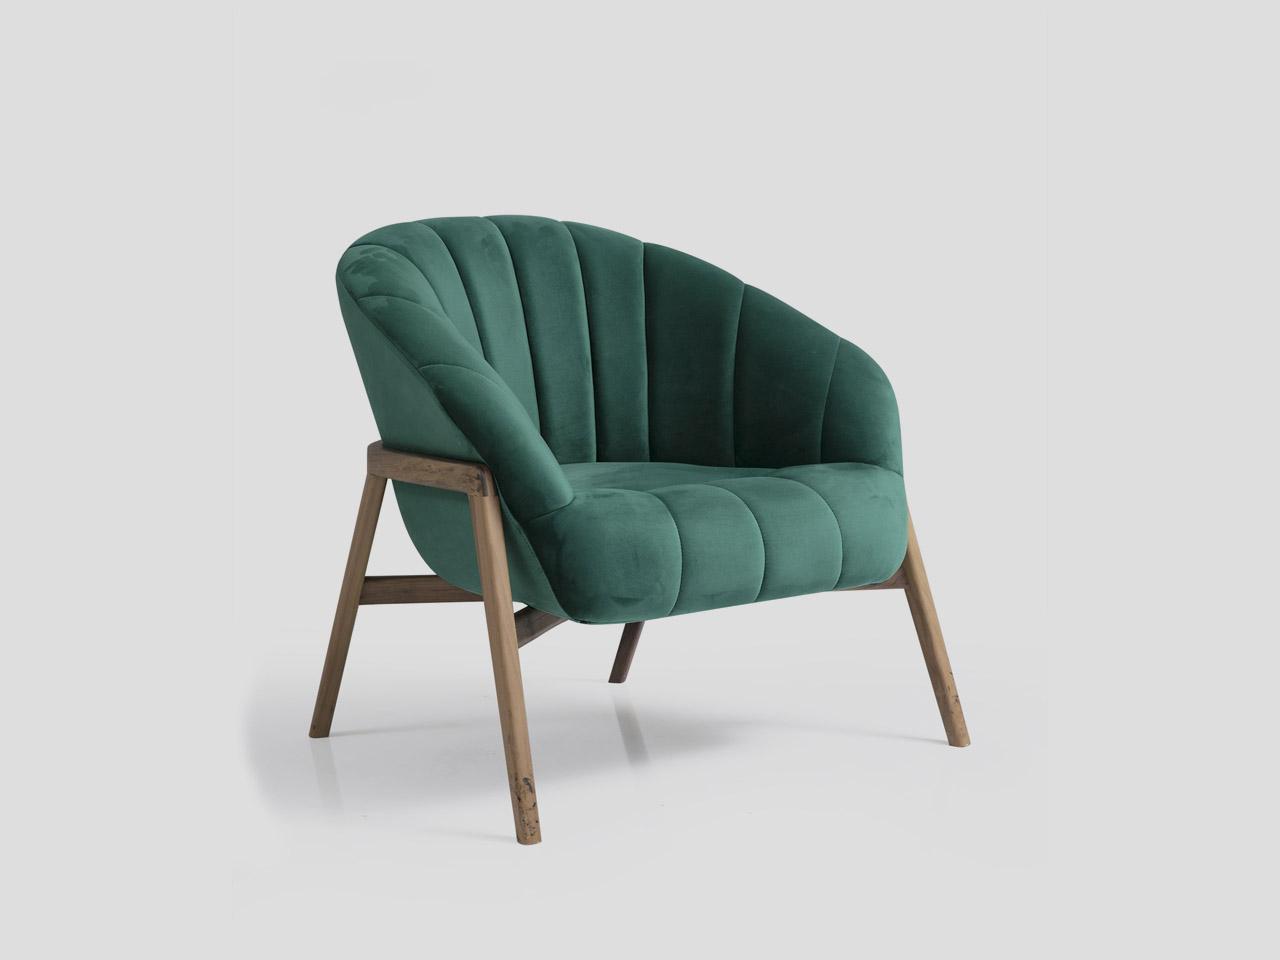 Fotelja Elizabet